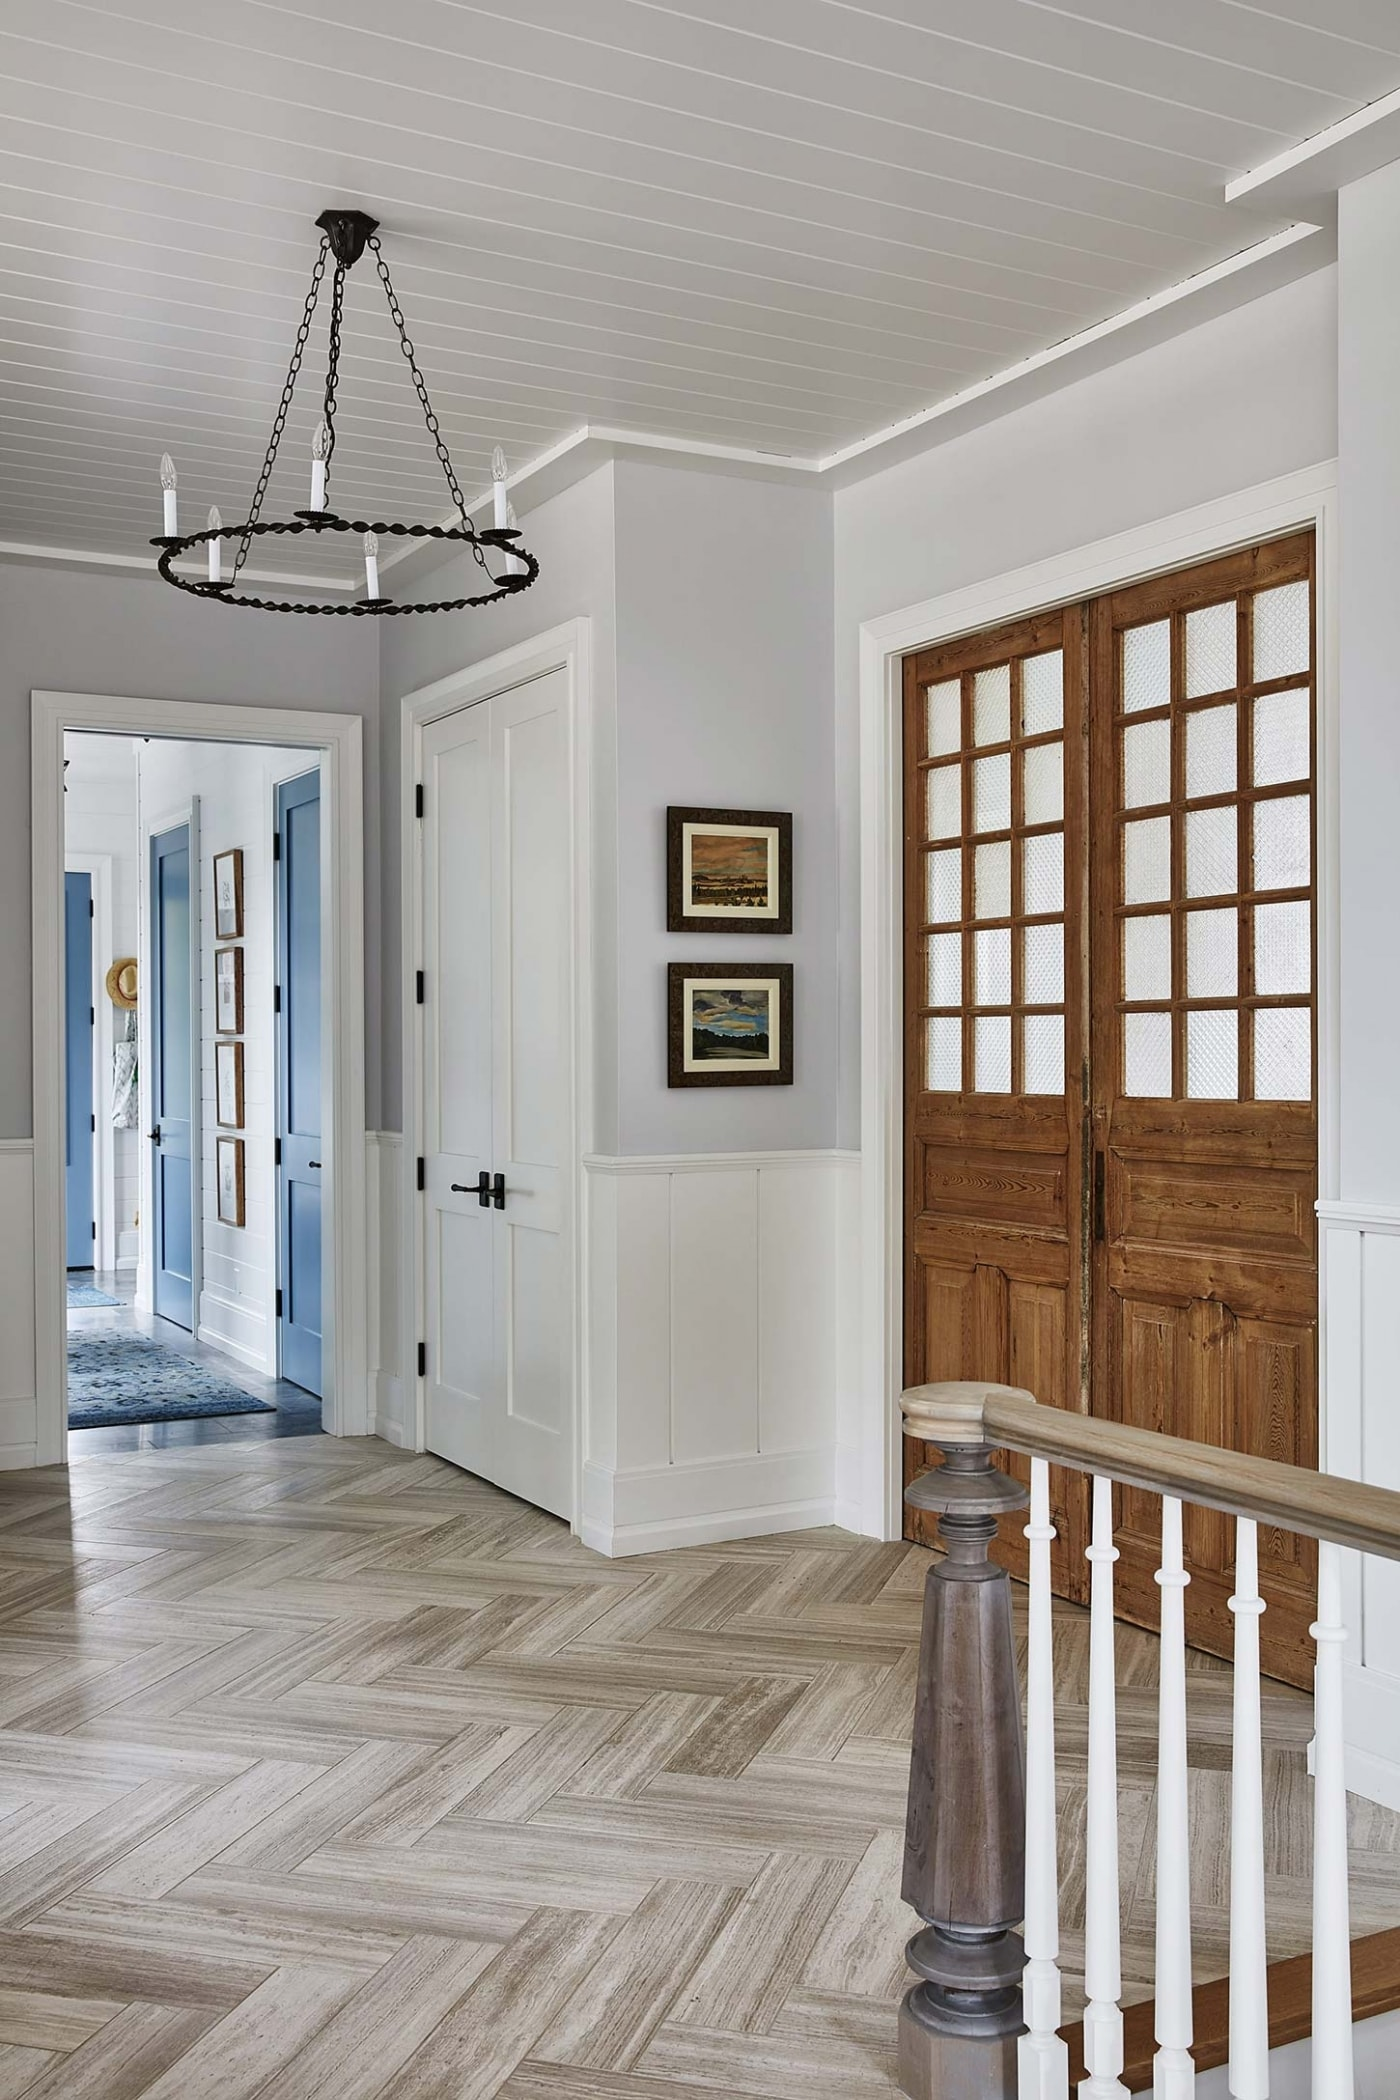 Foyer - Sarah off the Grid. Herringbone floors, beadboard ceiling, and modern country decor in Sarah Richardson's foyer.